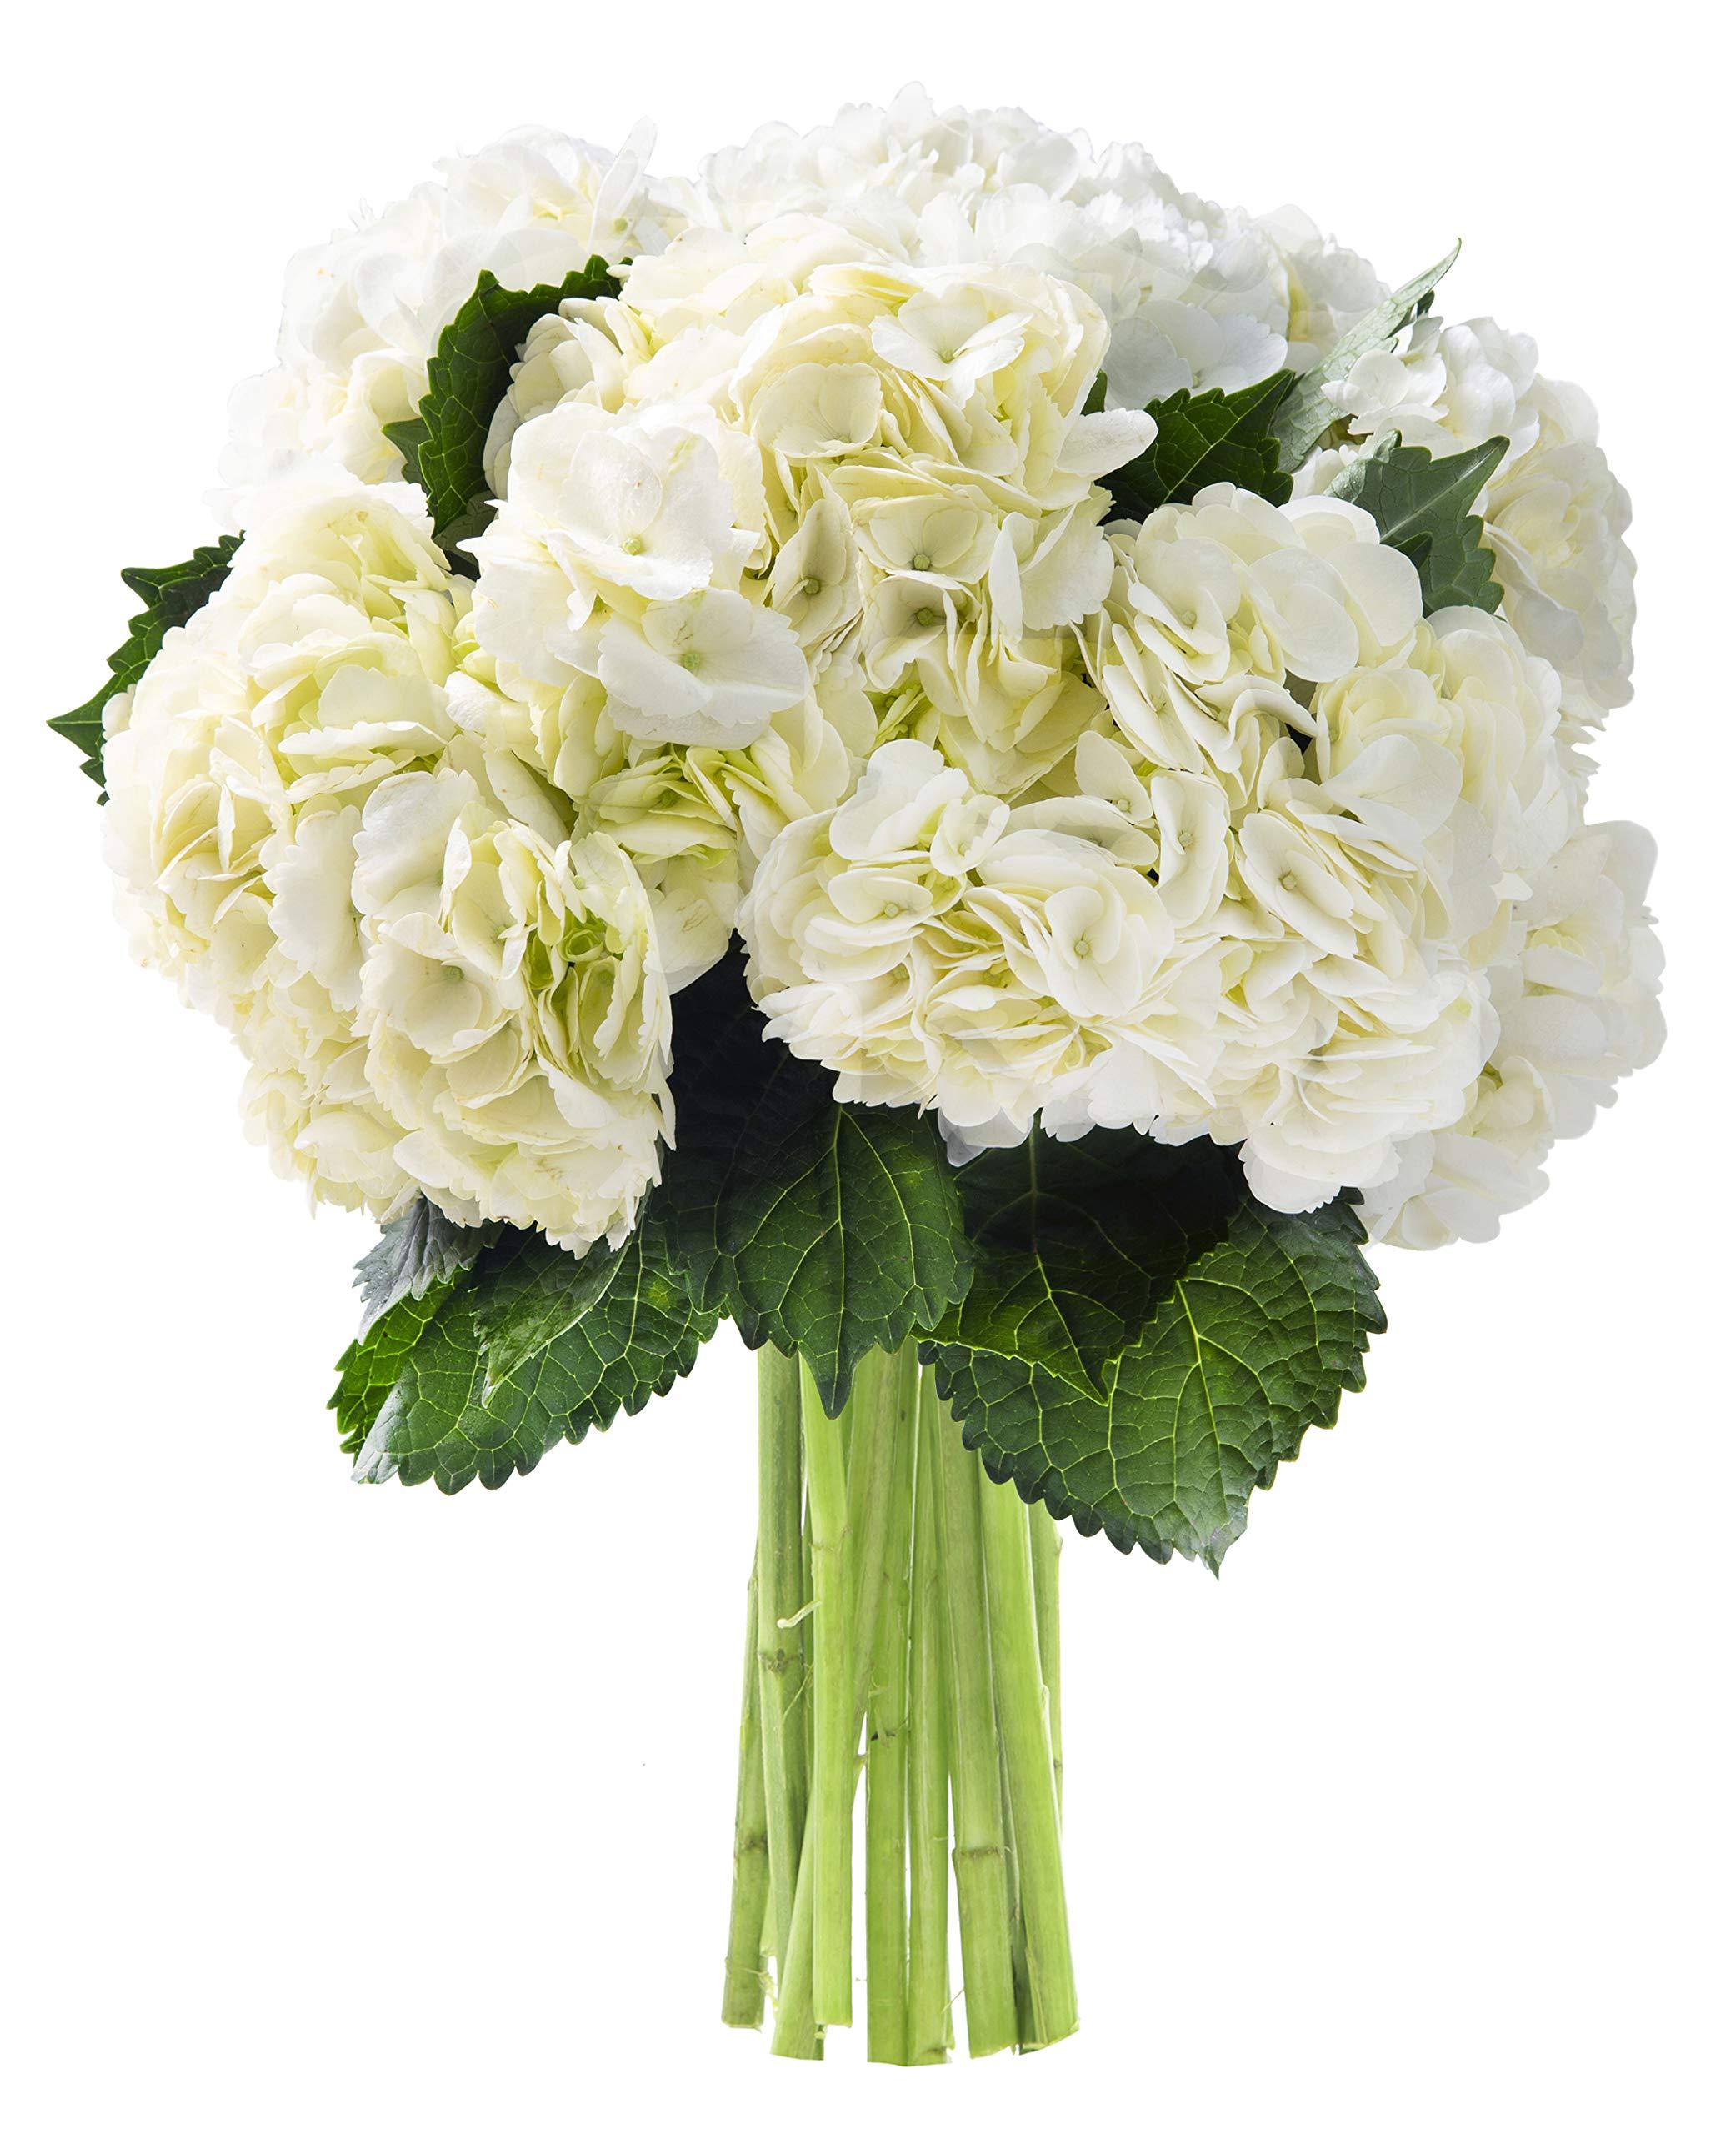 KaBloom Summer Beauty Bouquet of 6 White Hydrangeas by KaBloom